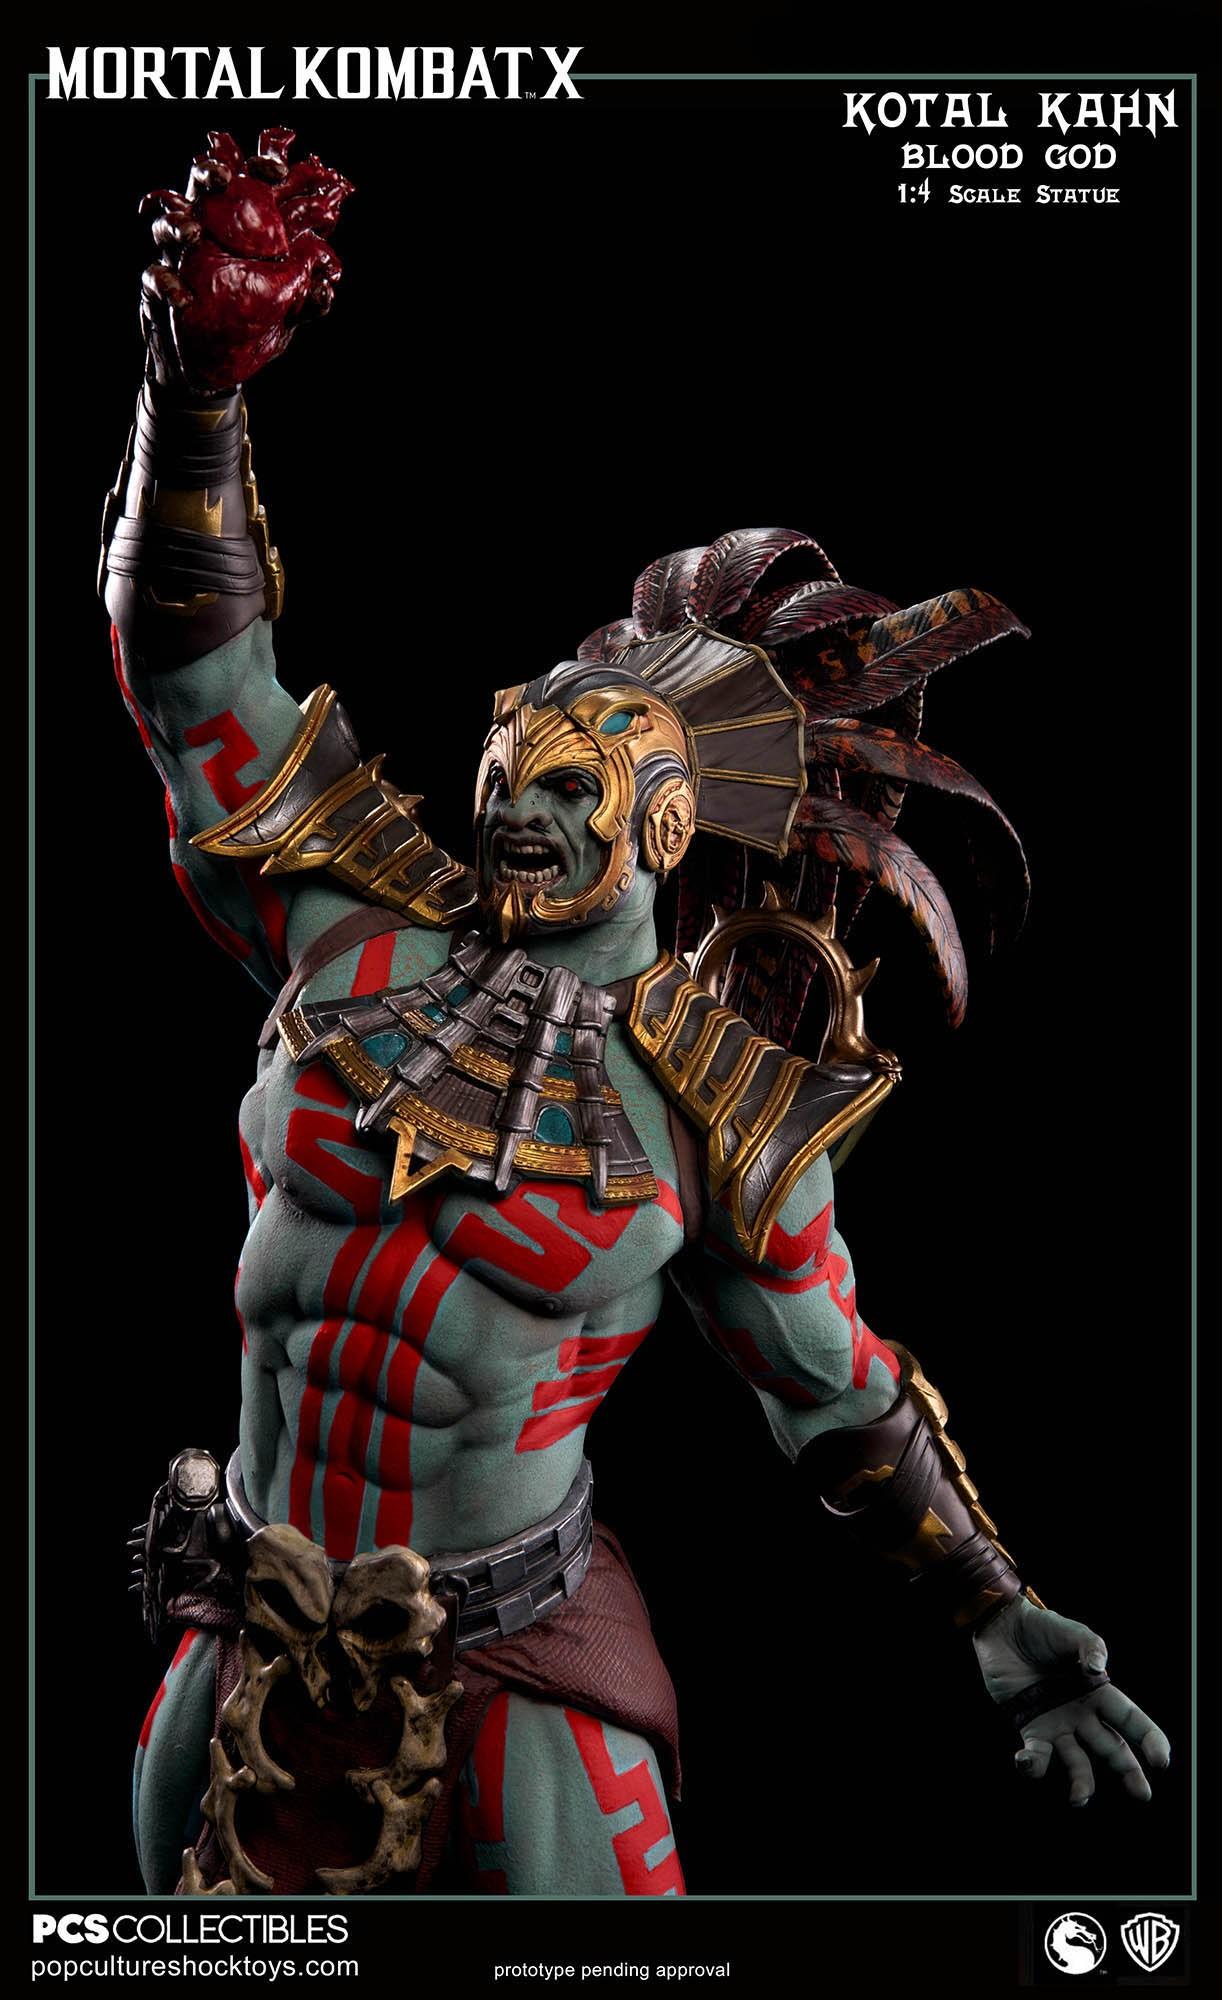 [Pop Culture Shock] Mortal Kombat X: Kotal Kahn 1:4 scale PCS-Kotal-Kahn-Blood-God-014